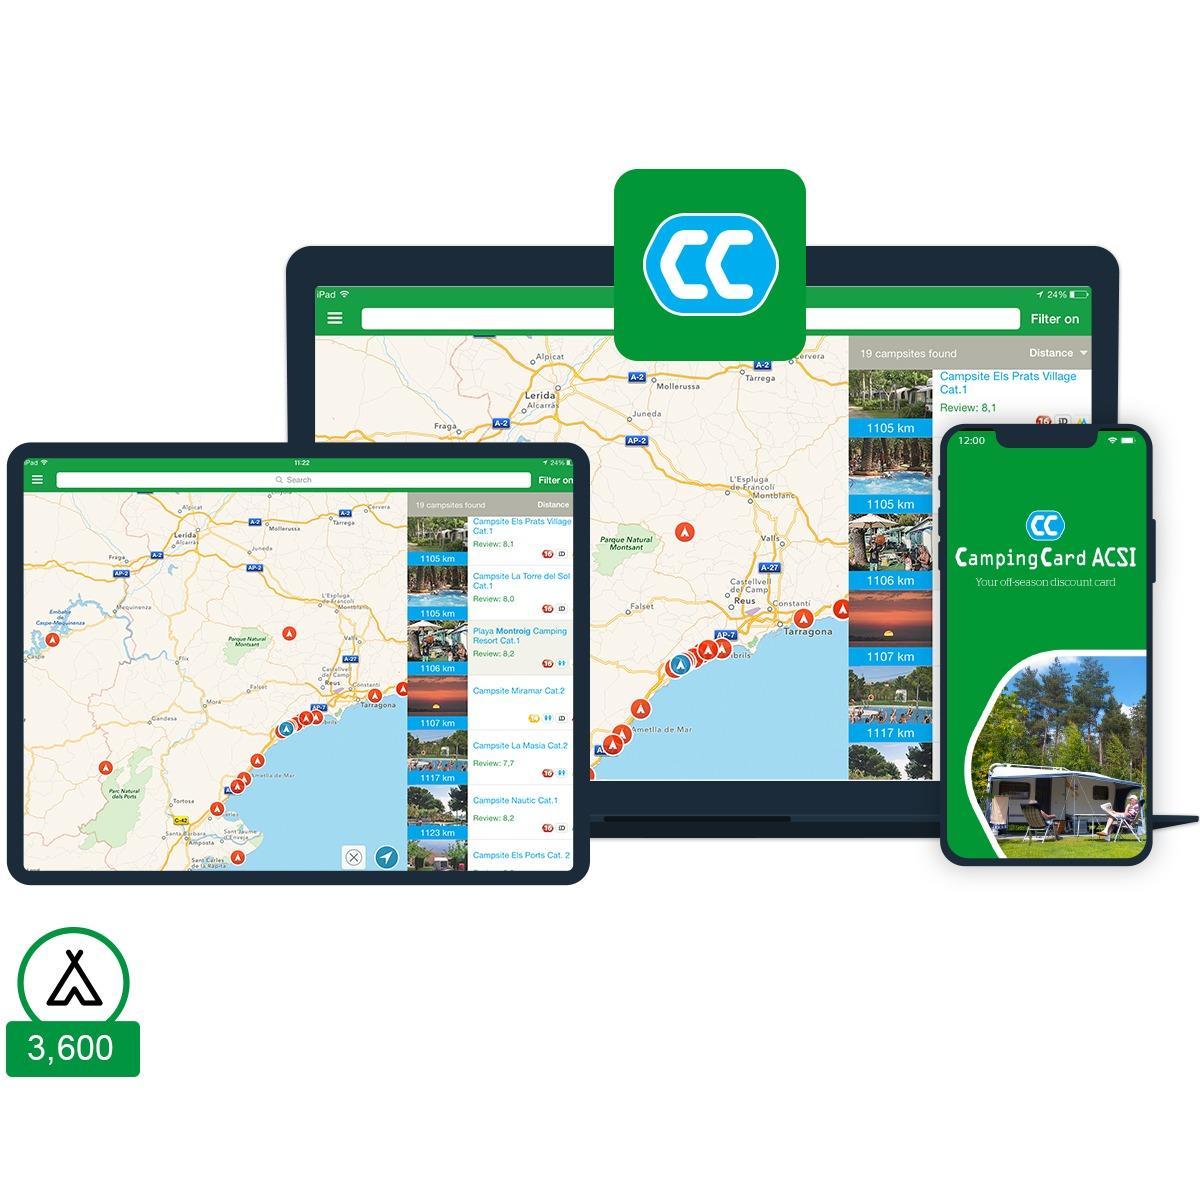 CampingCard ACSI app 2020 (campsites)